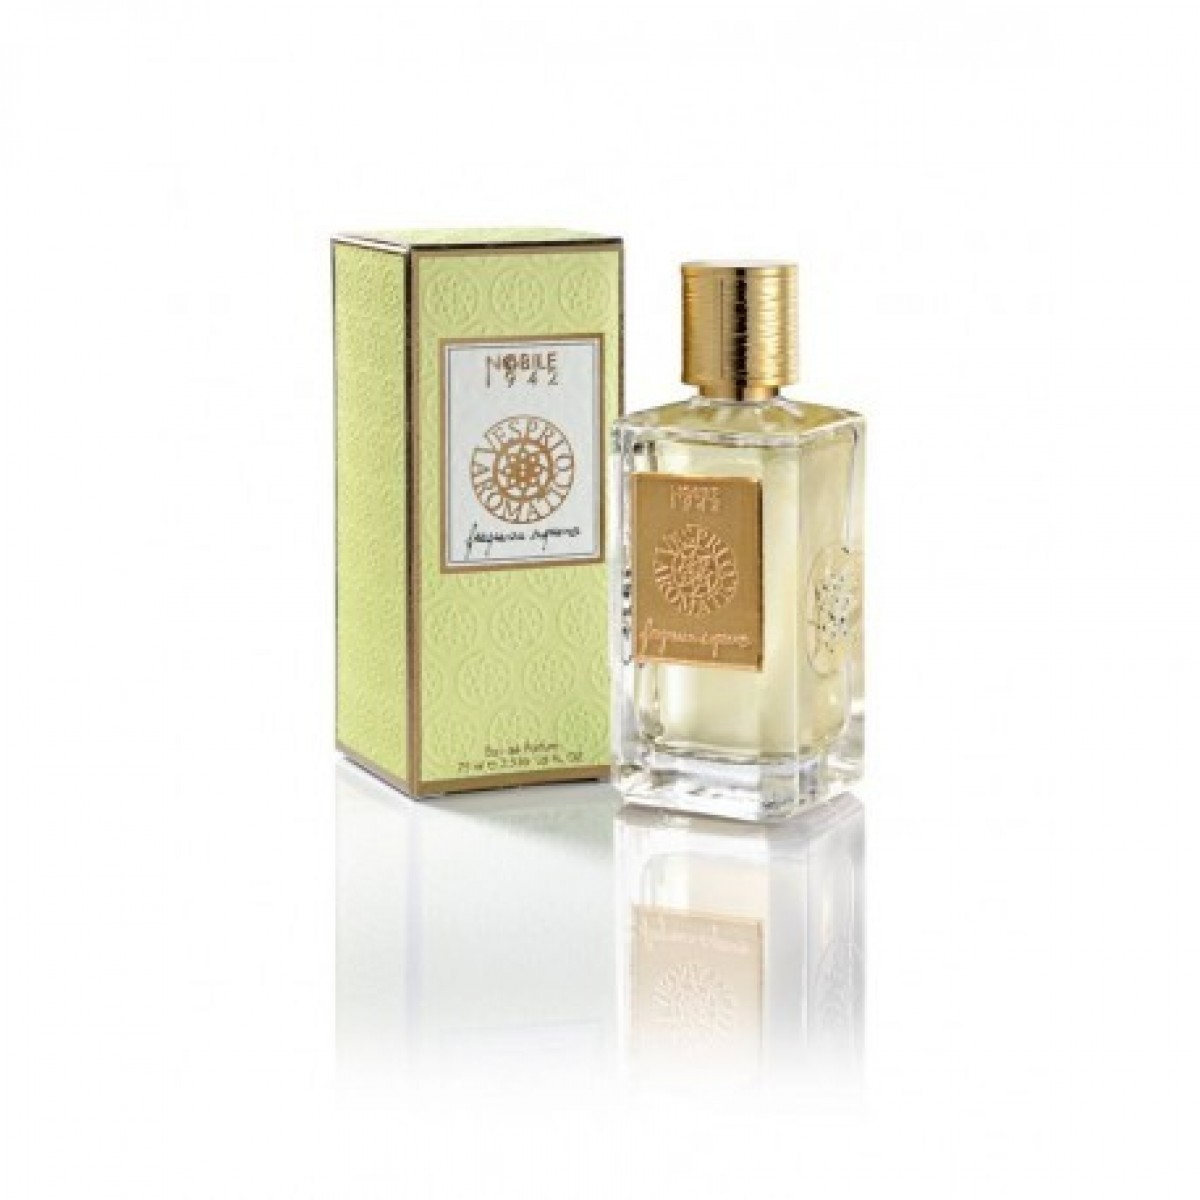 Vespri Aromatico Eau de Parfum